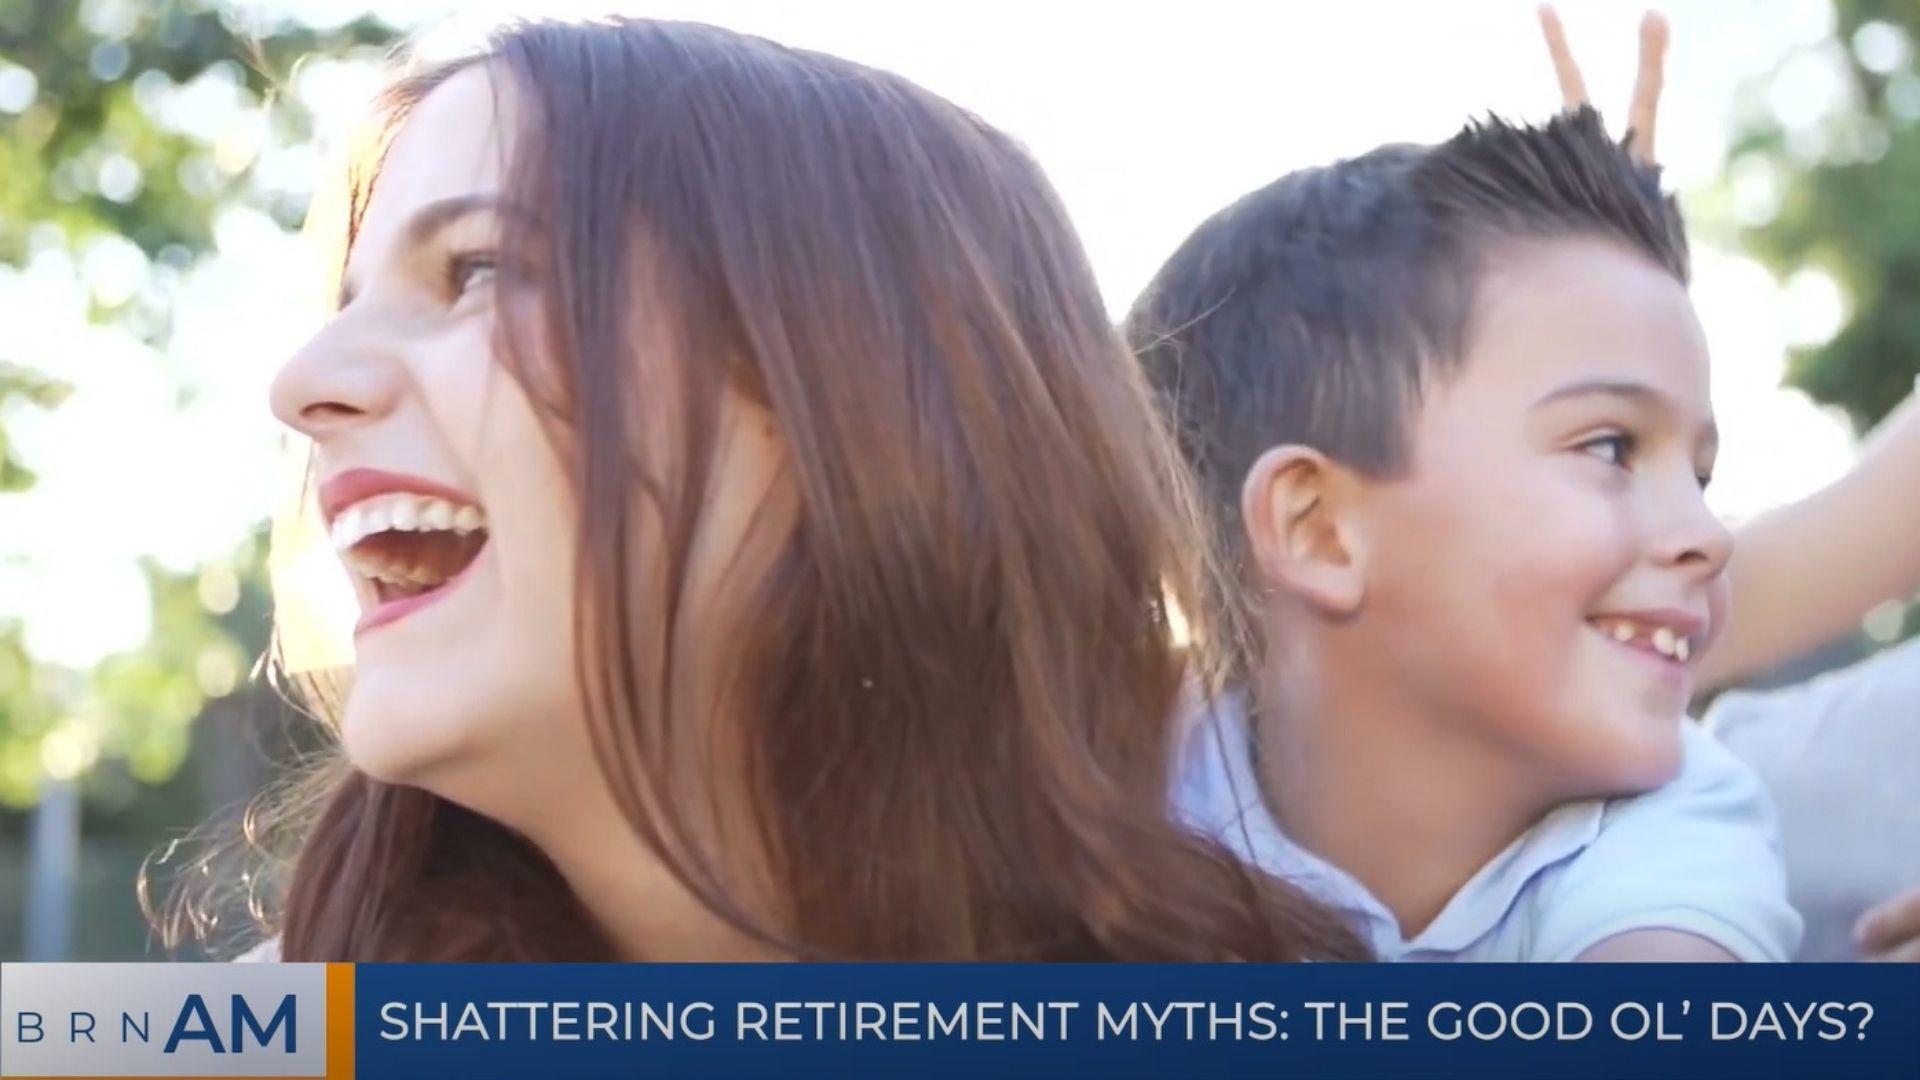 BRN AM   Shattering retirement myths: the good ol' days?